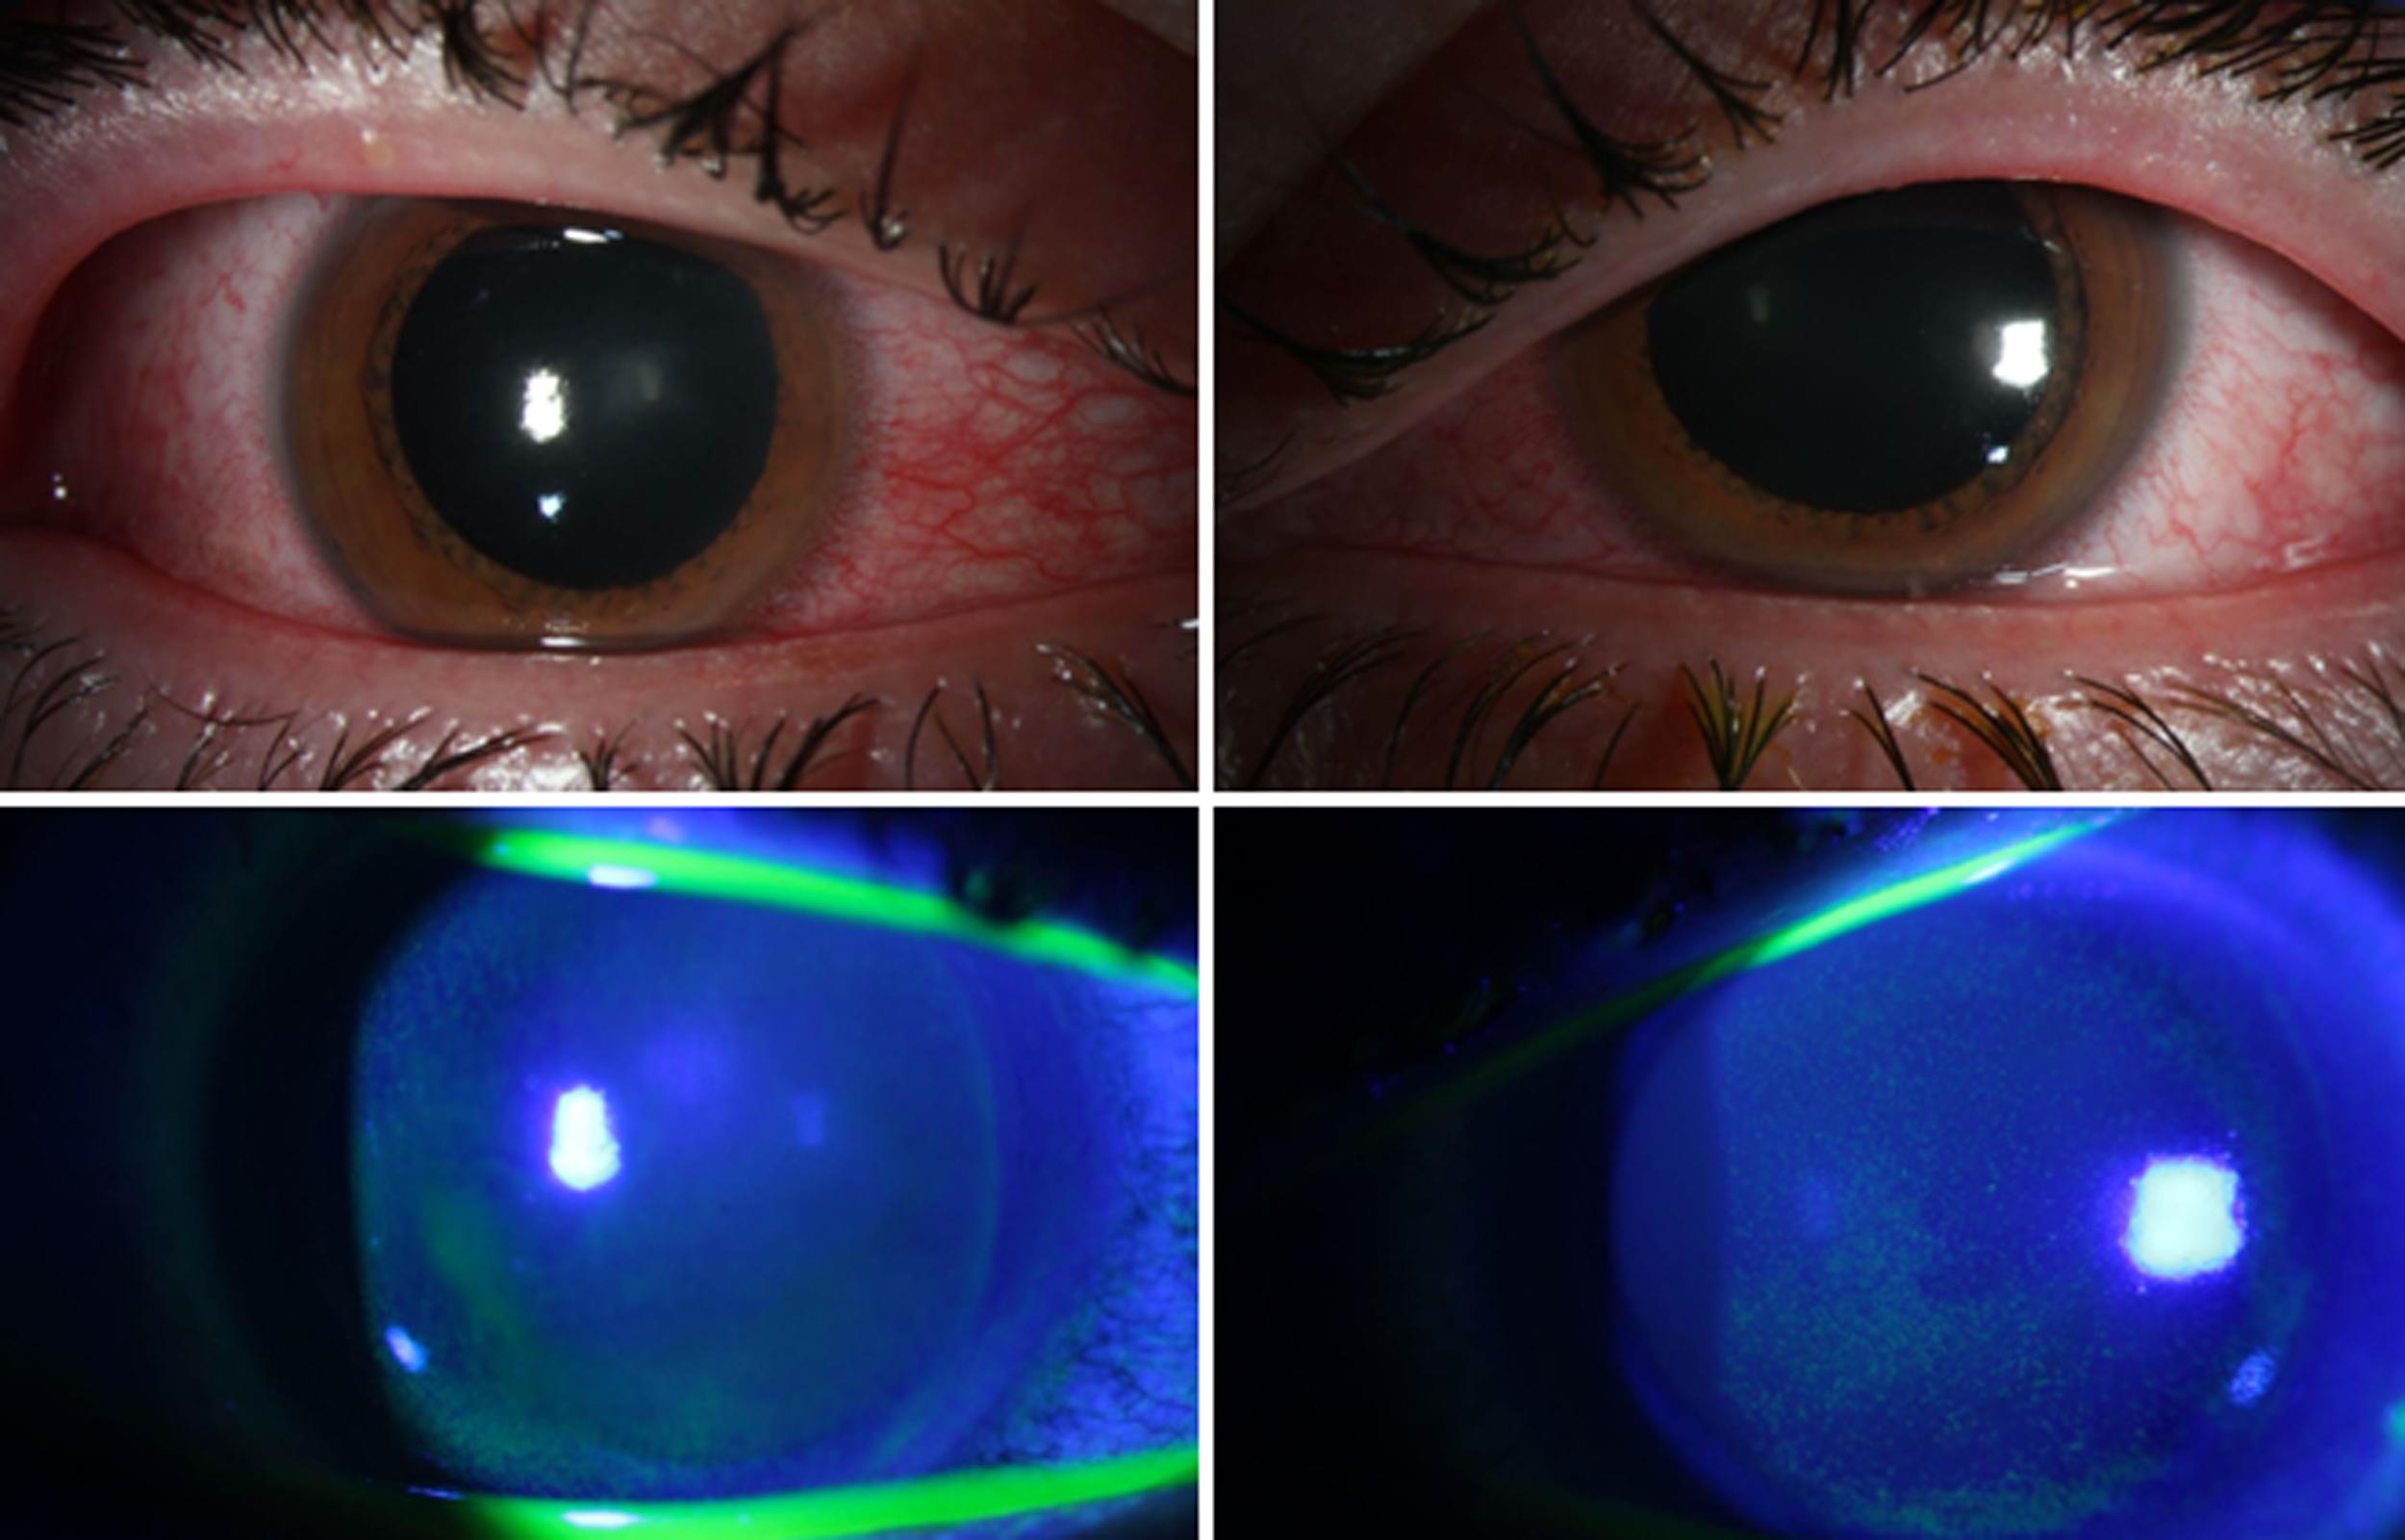 Doctors warn about eye damage from UV lights to kill the coronavirus thumbnail